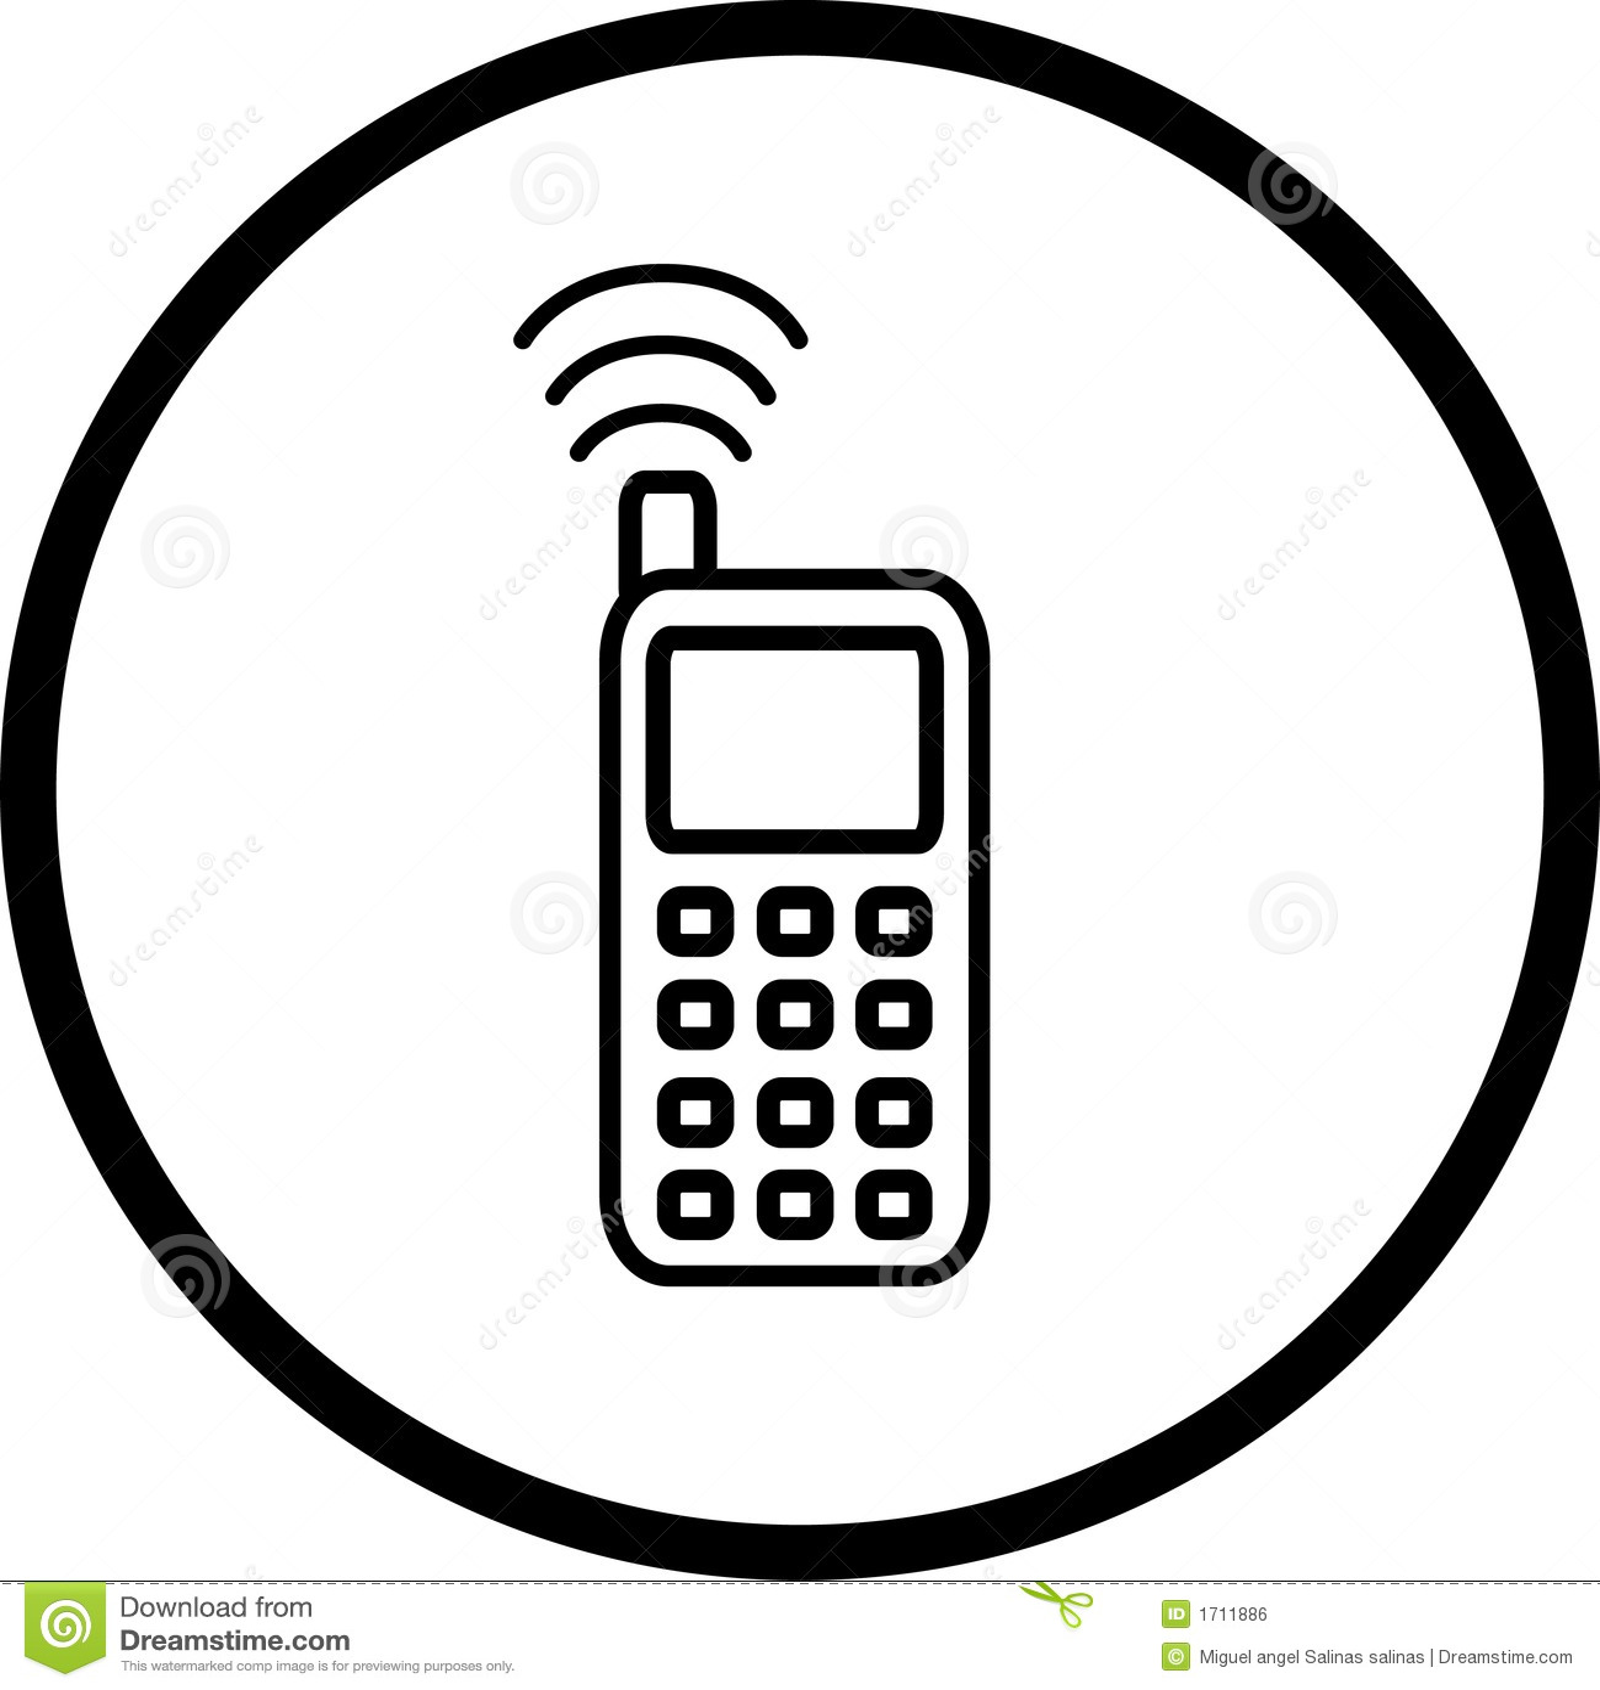 s u00edmbolo del tel u00e9fono celular ilustraci u00f3n del vector